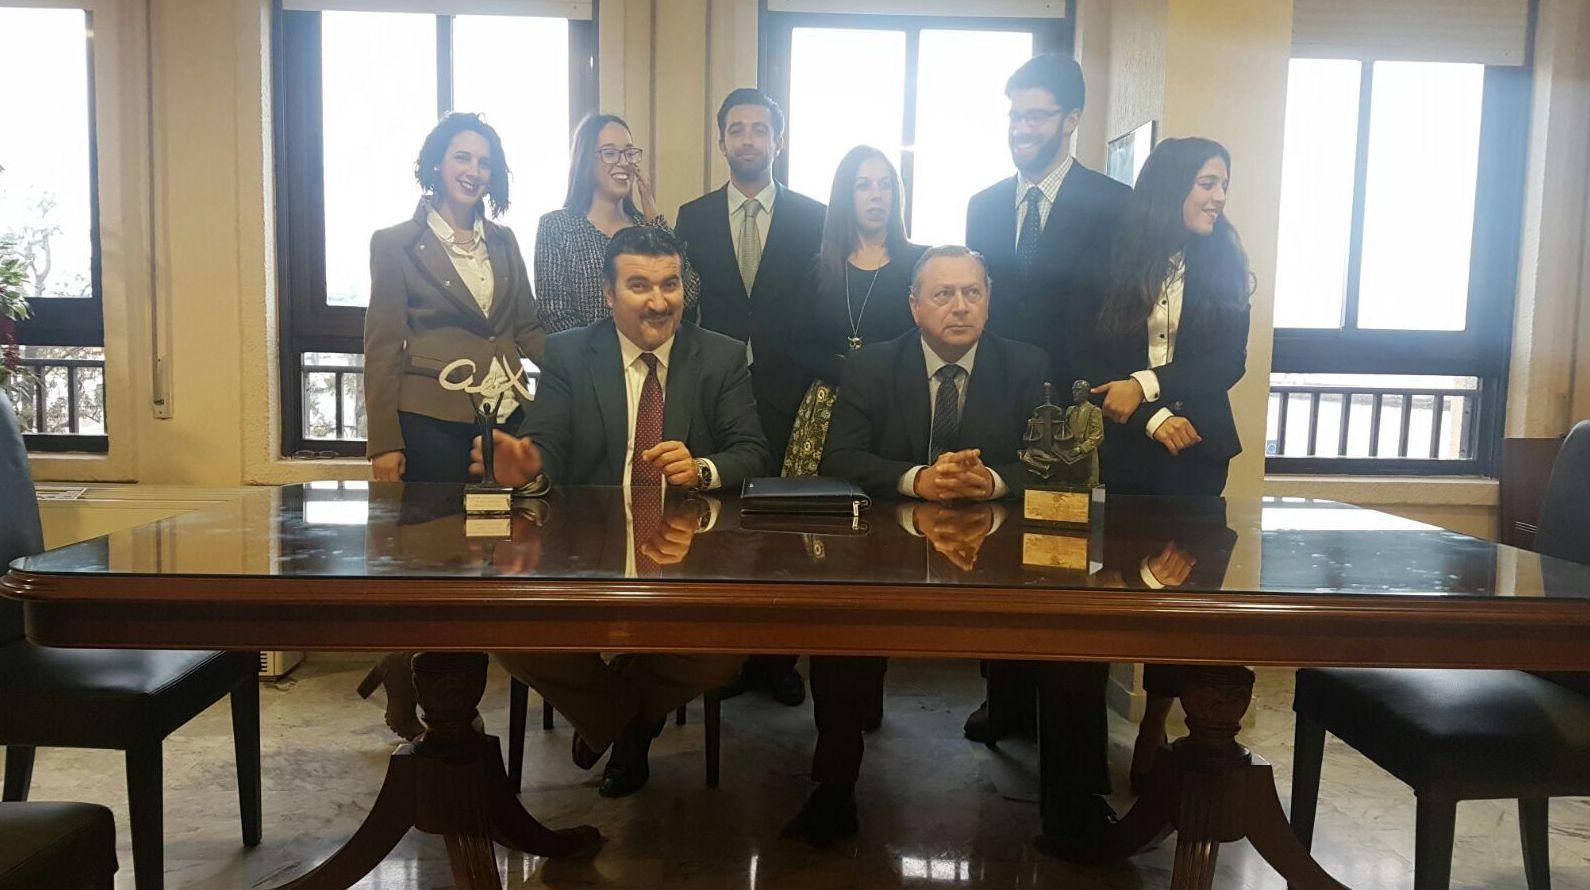 Salón de reuniones Legalsegur Cádiz